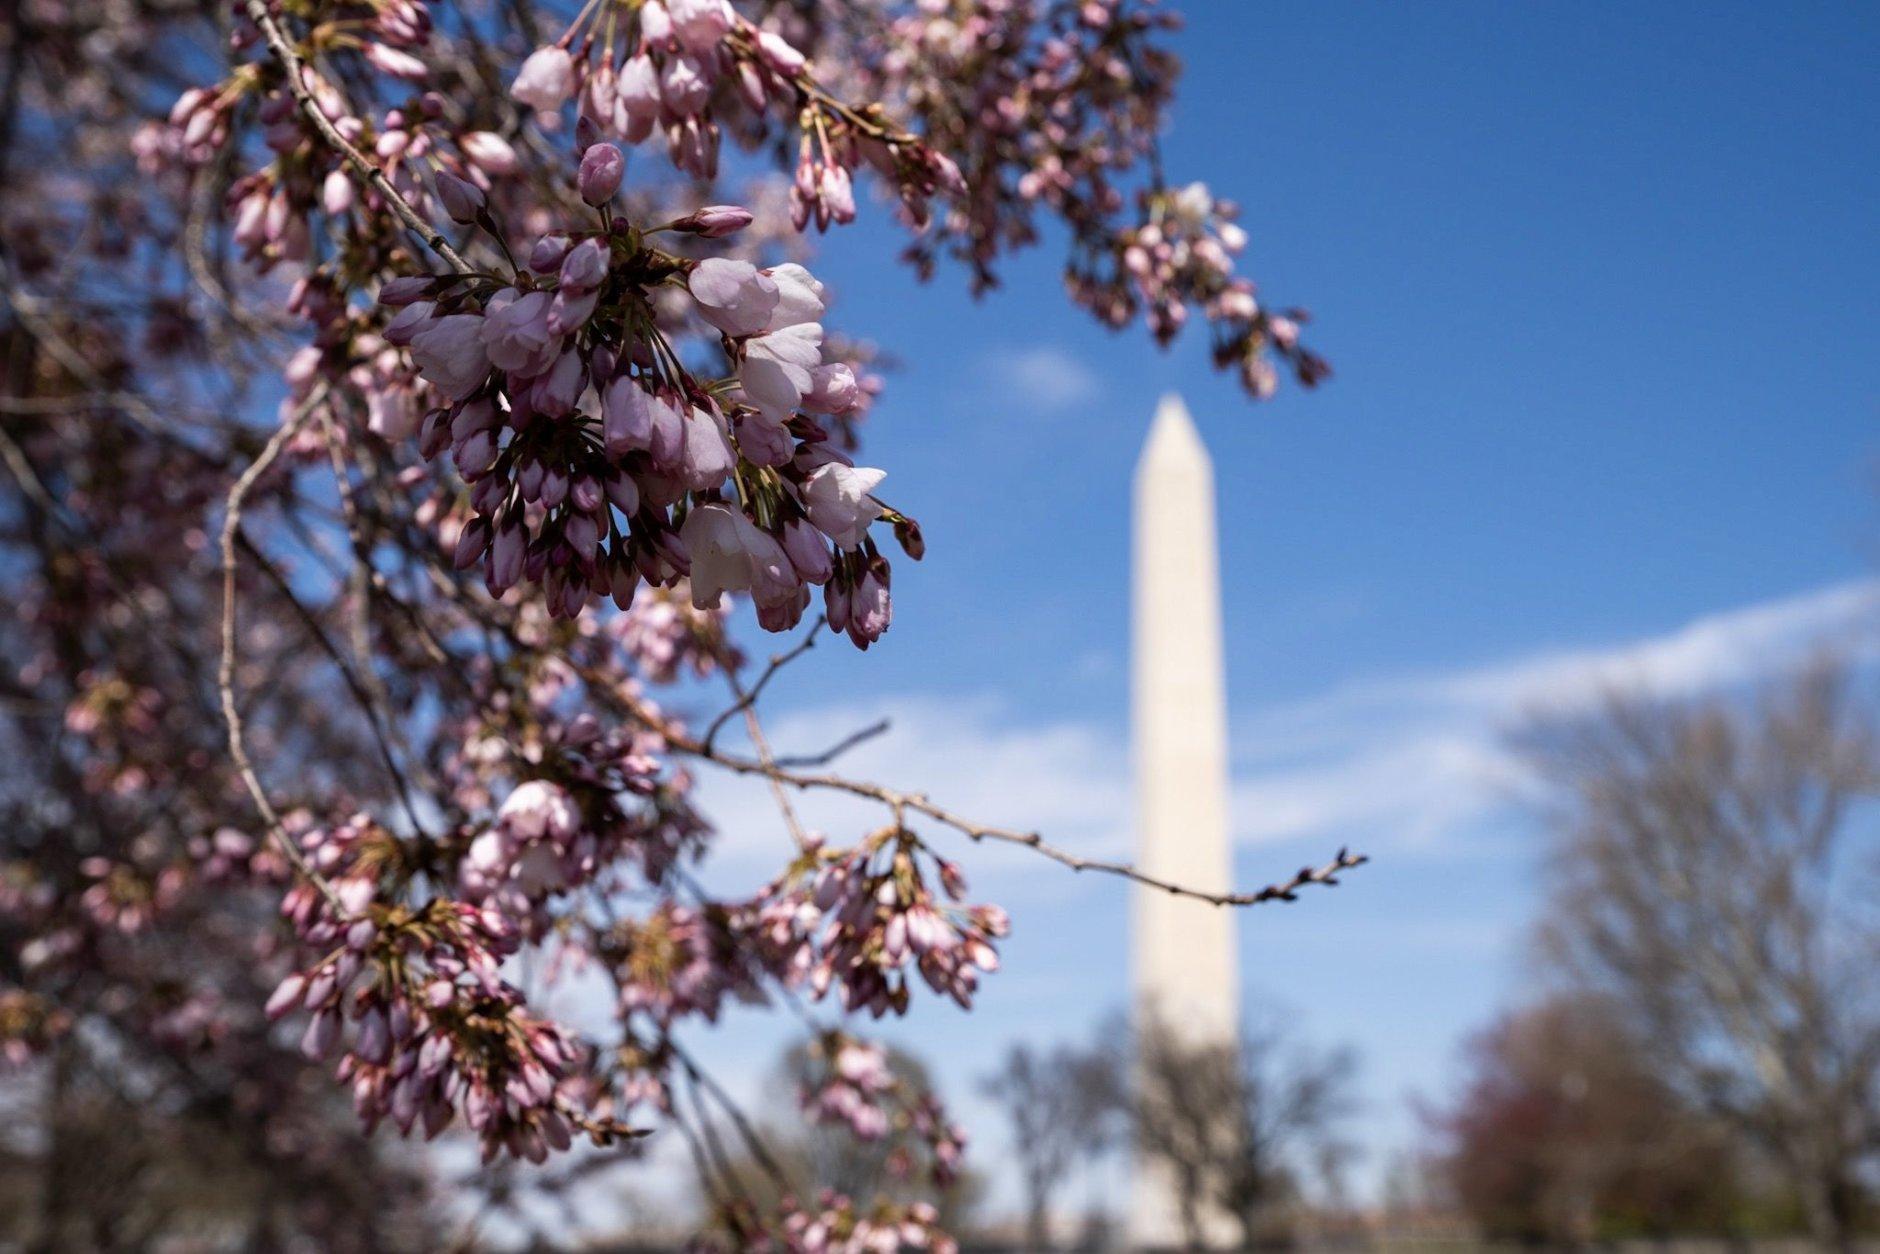 Cherry blossoms along the Tidal Basin near the Cherry Blossom Festival's main stage on March 28. (WTOP/Alejandro Alvarez)